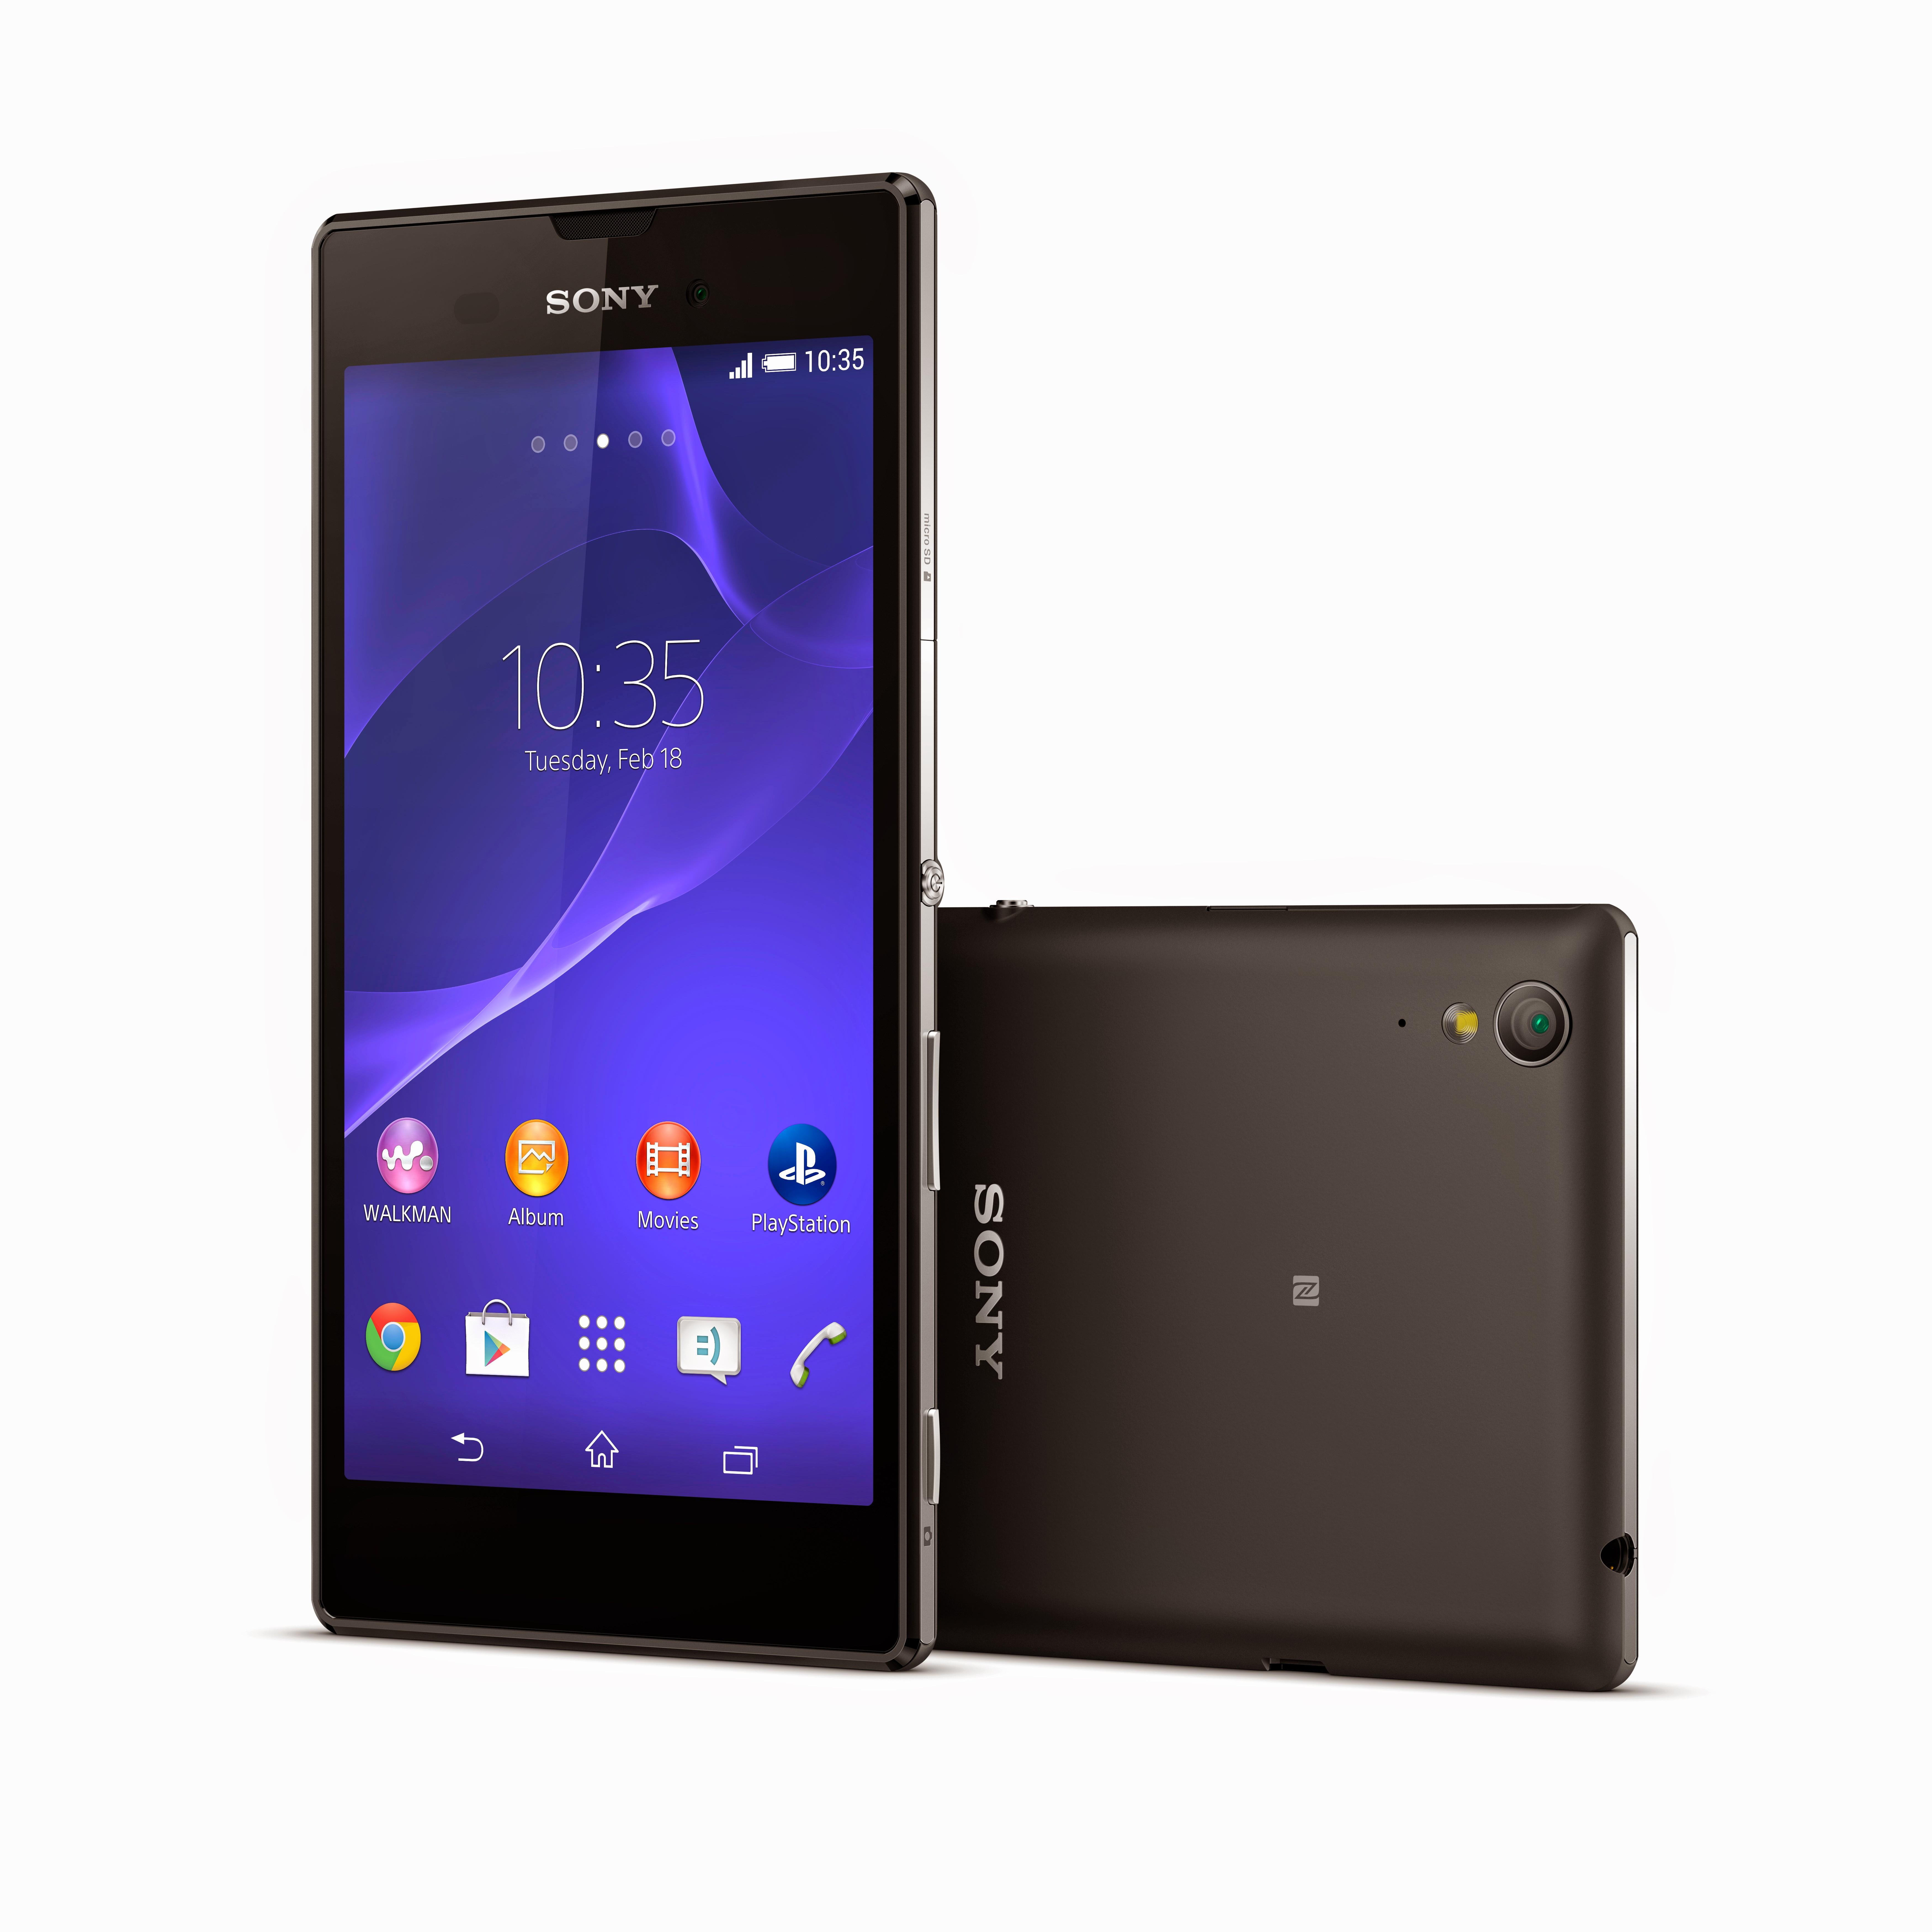 "Sony Xperia T3 - smartphone z 5,3"" ekranem, Snapdragon 400 i LTE"